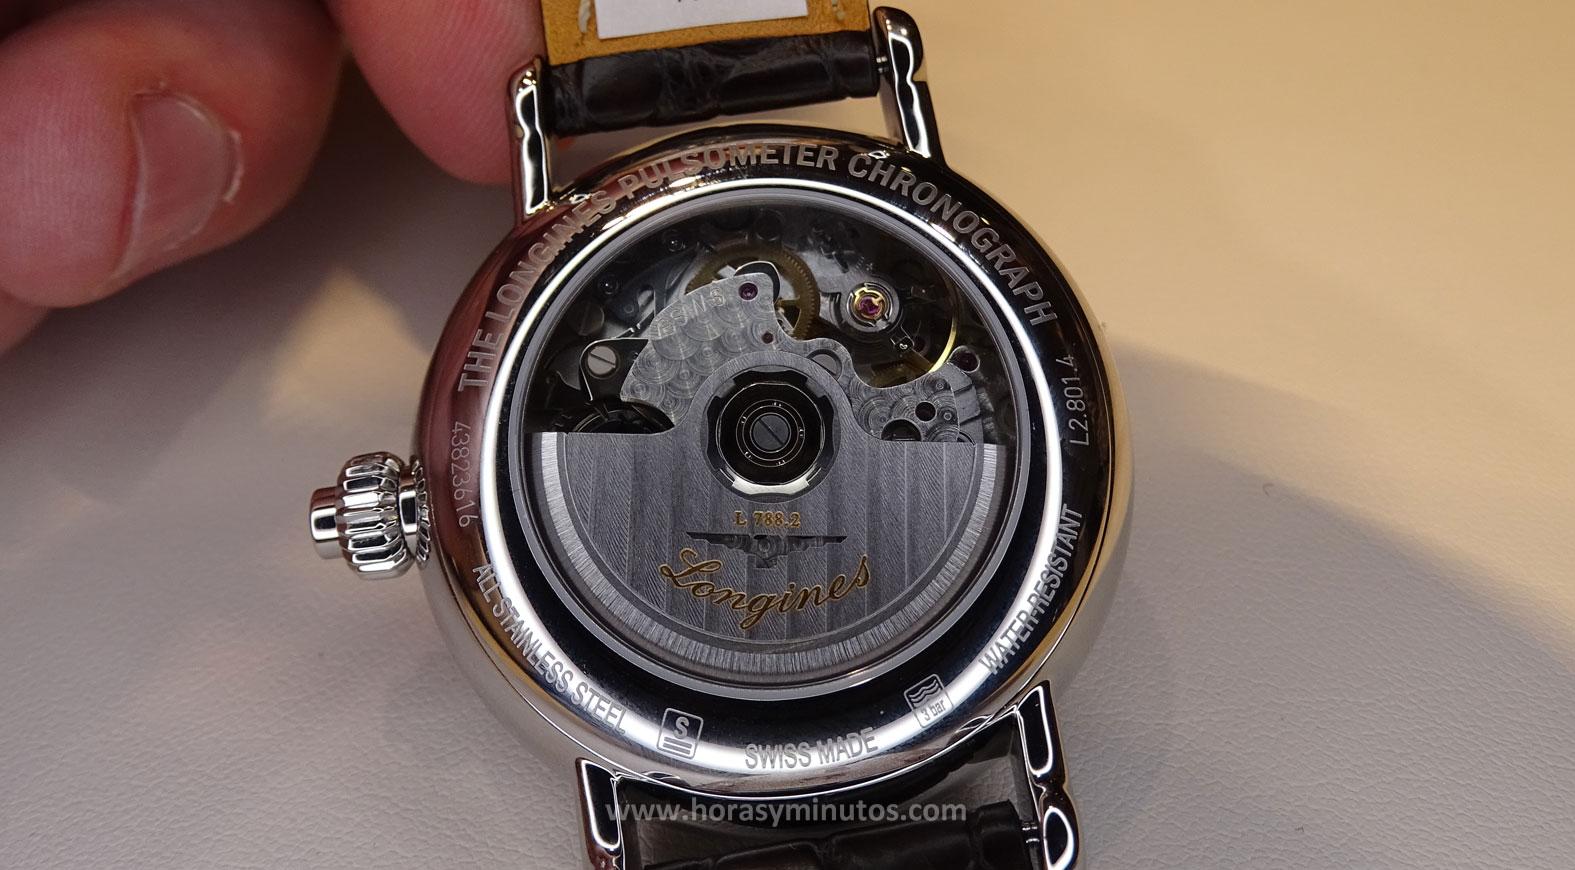 Longines Pulsometer Chronograph - calibre